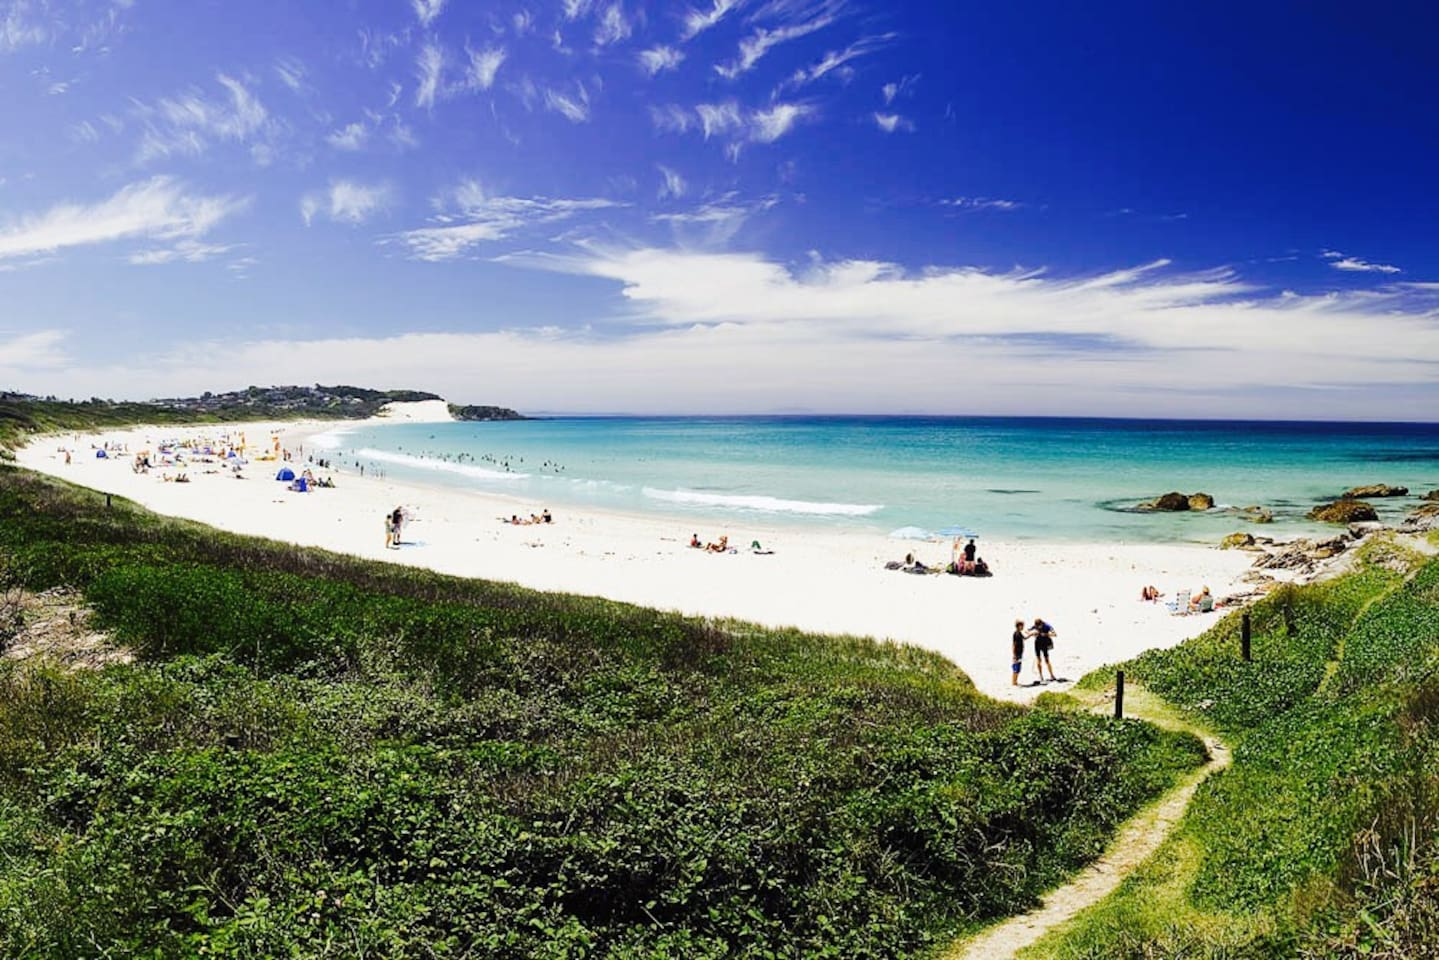 3 minute walk to this beach